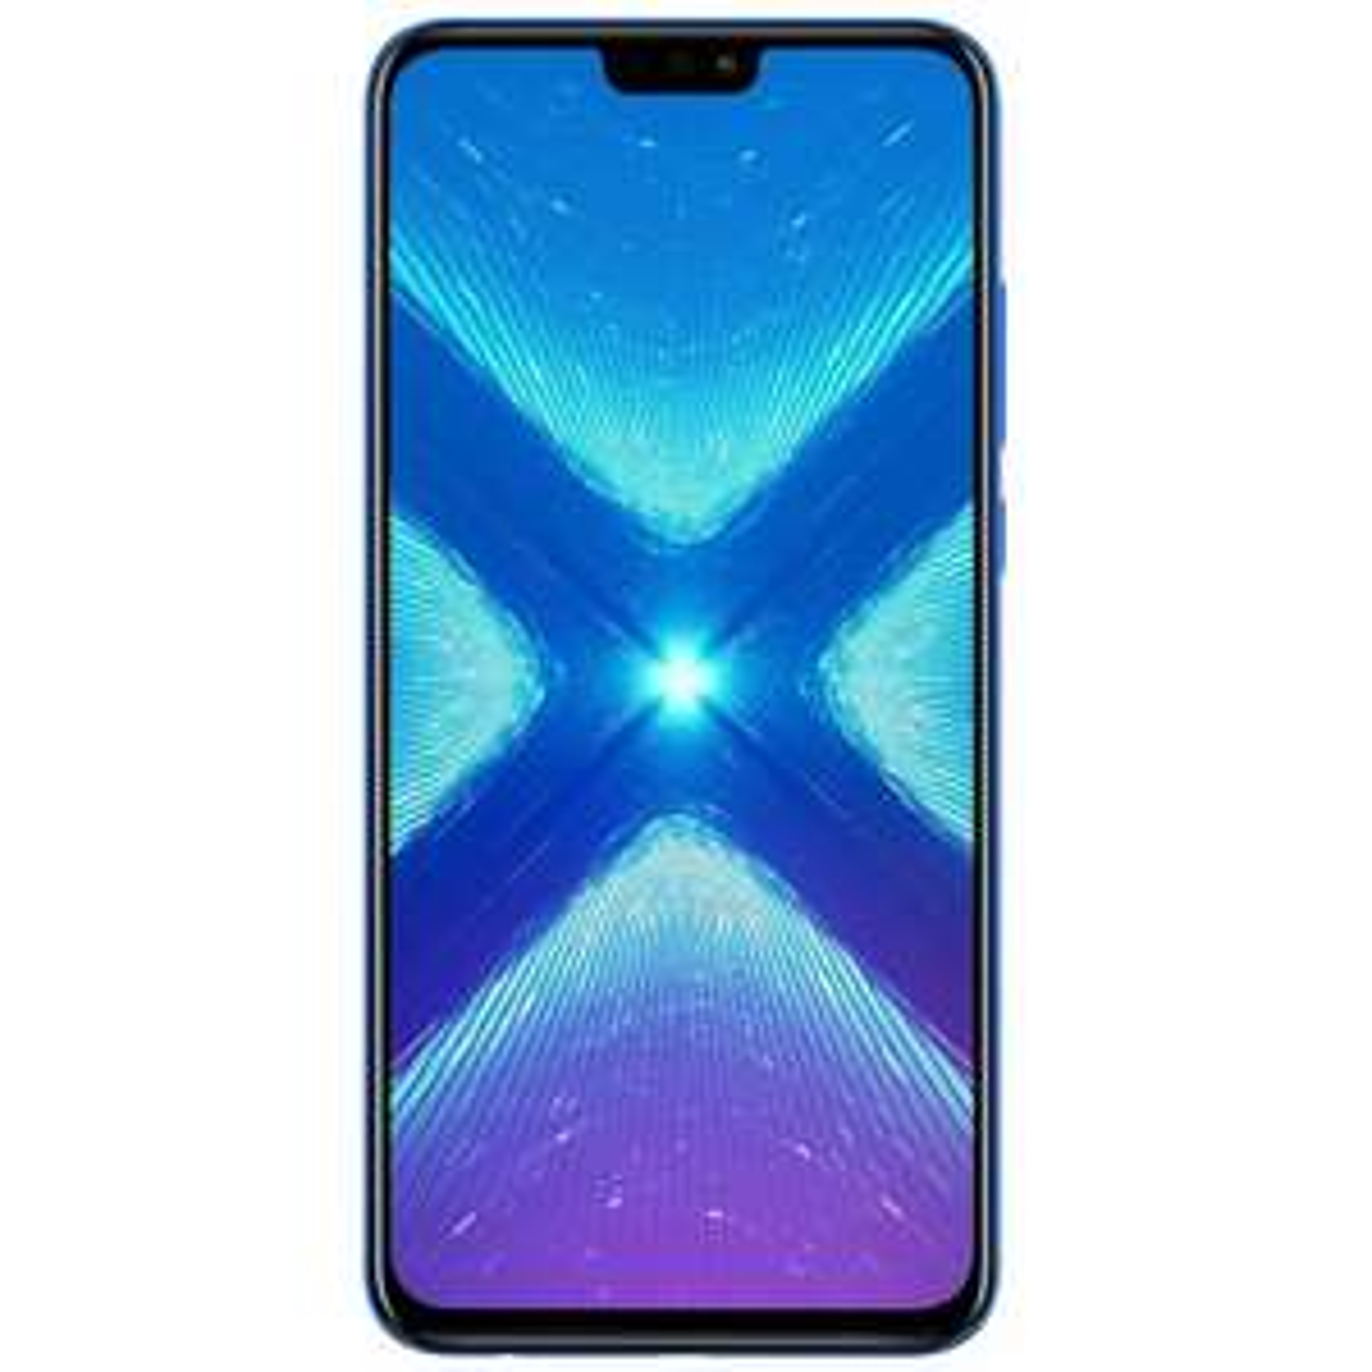 SIM Free Honor 8X 6.5 Inch 64GB 16MP Dual Sim Mobile Phone - Blue Argos Refurbished £149.99 @ Ebay